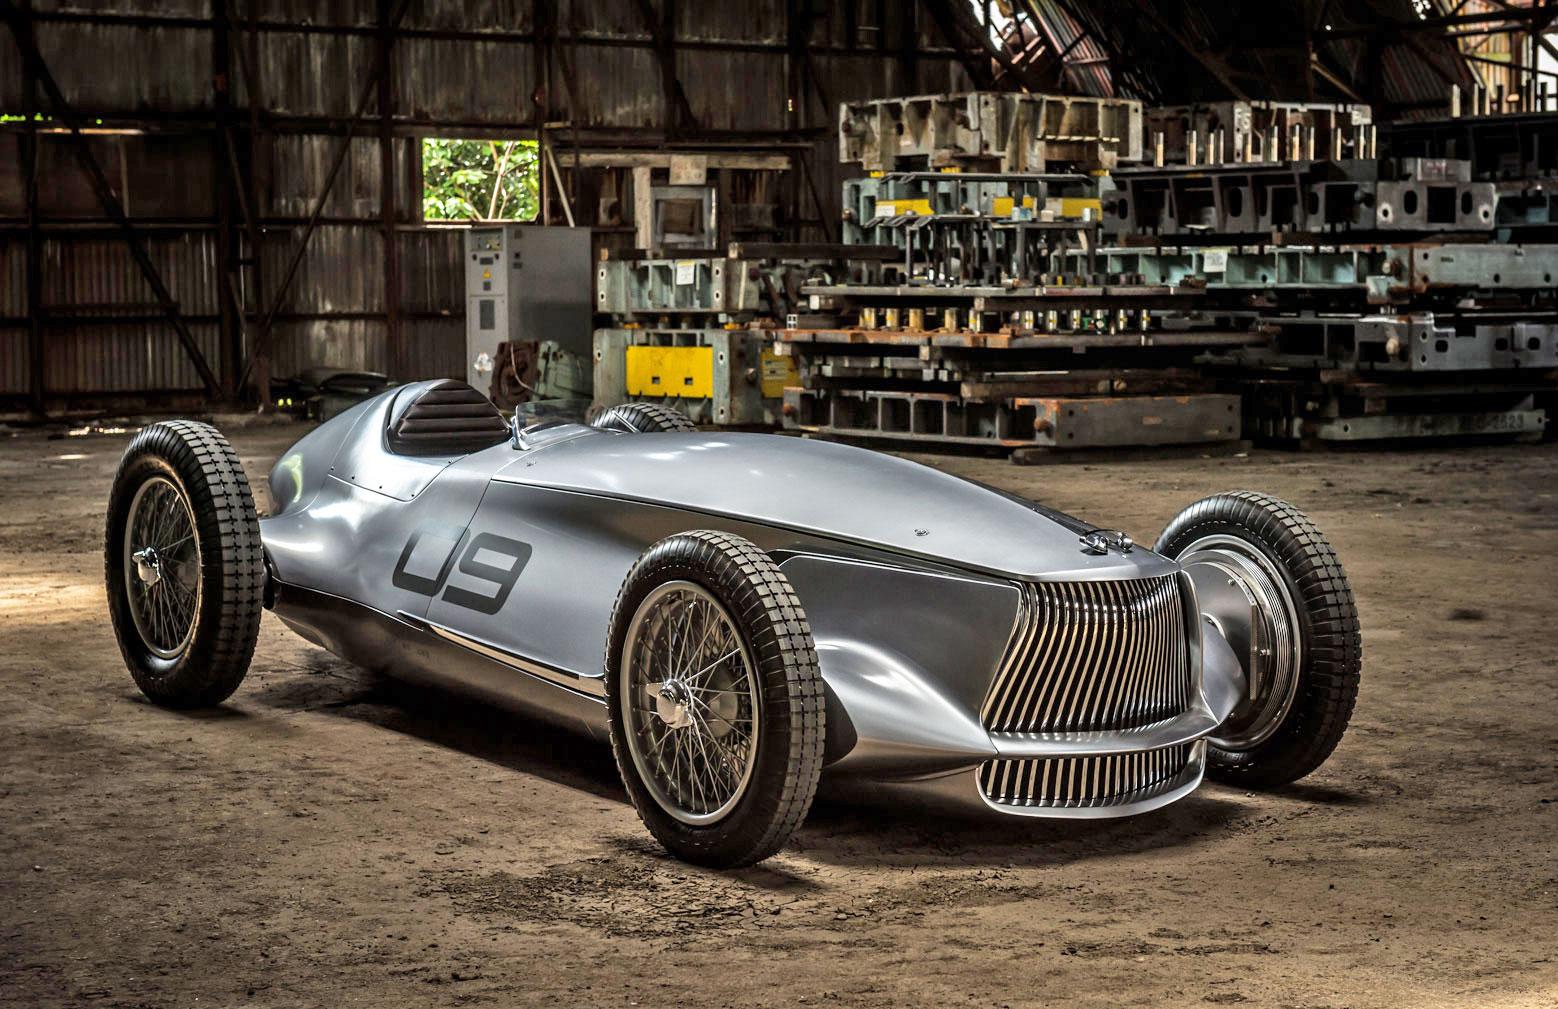 infinity classic car  Infiniti prototype melds a 1940s race car with EV power